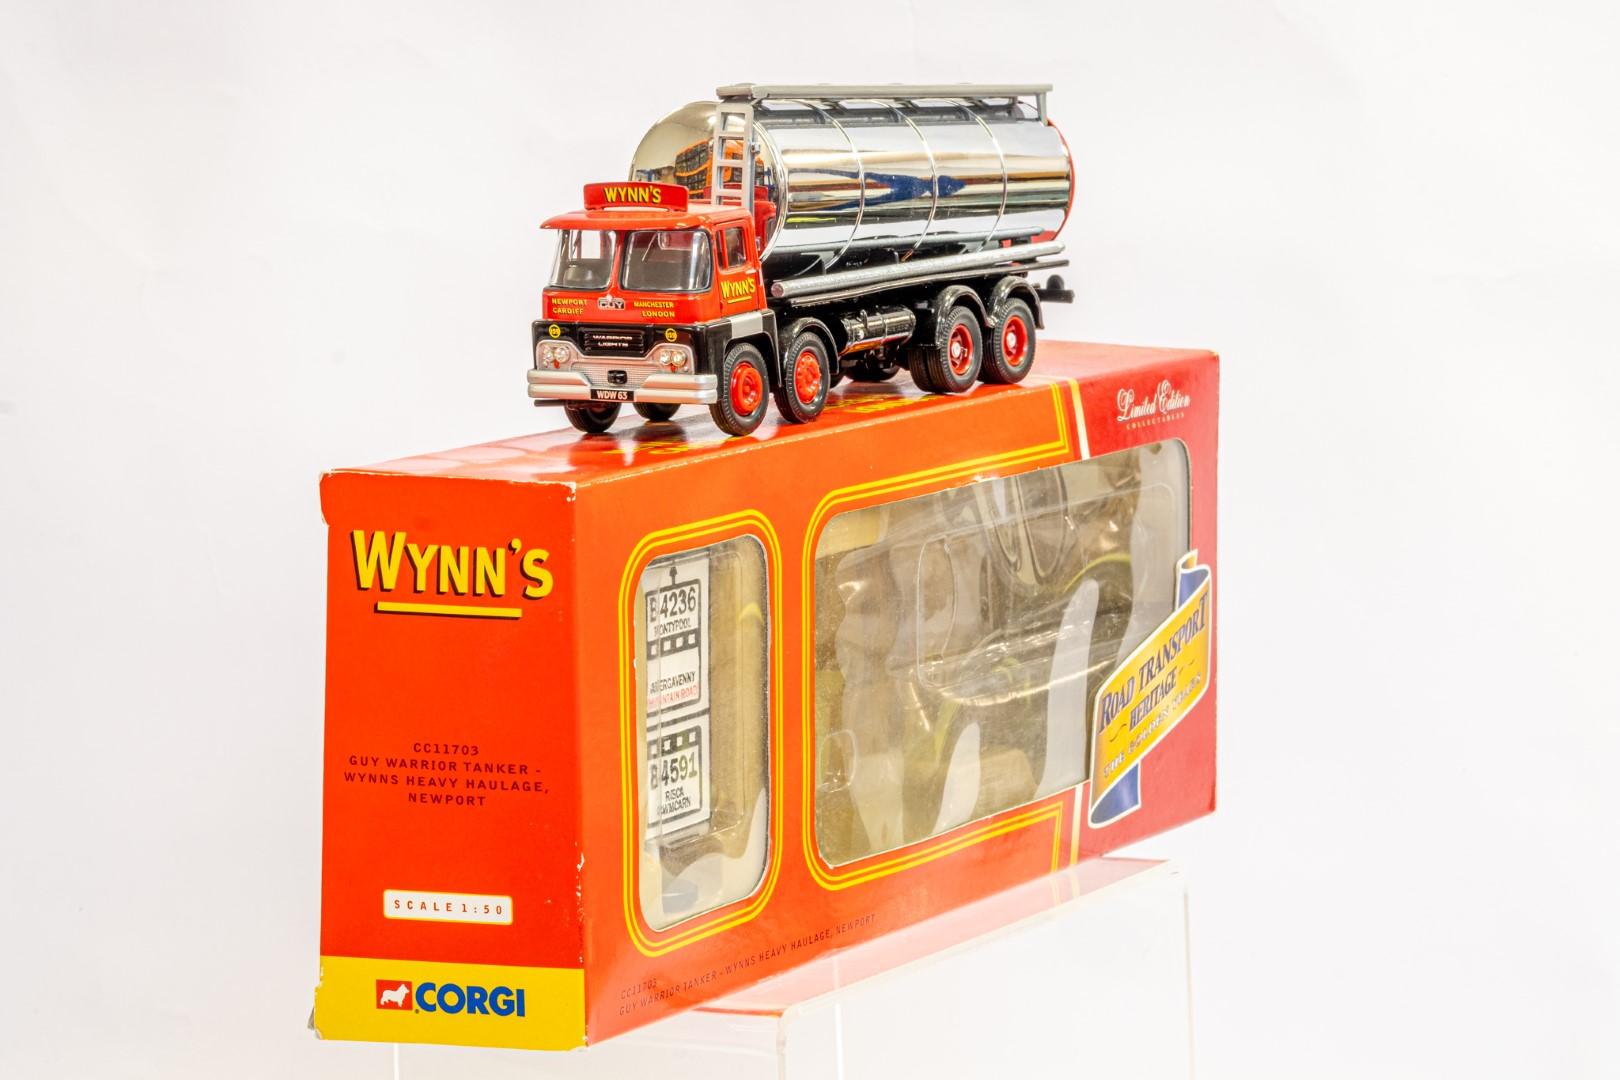 Corgi Guy Warrior Tanker - Wynns Heavy Haulage - Image 3 of 8